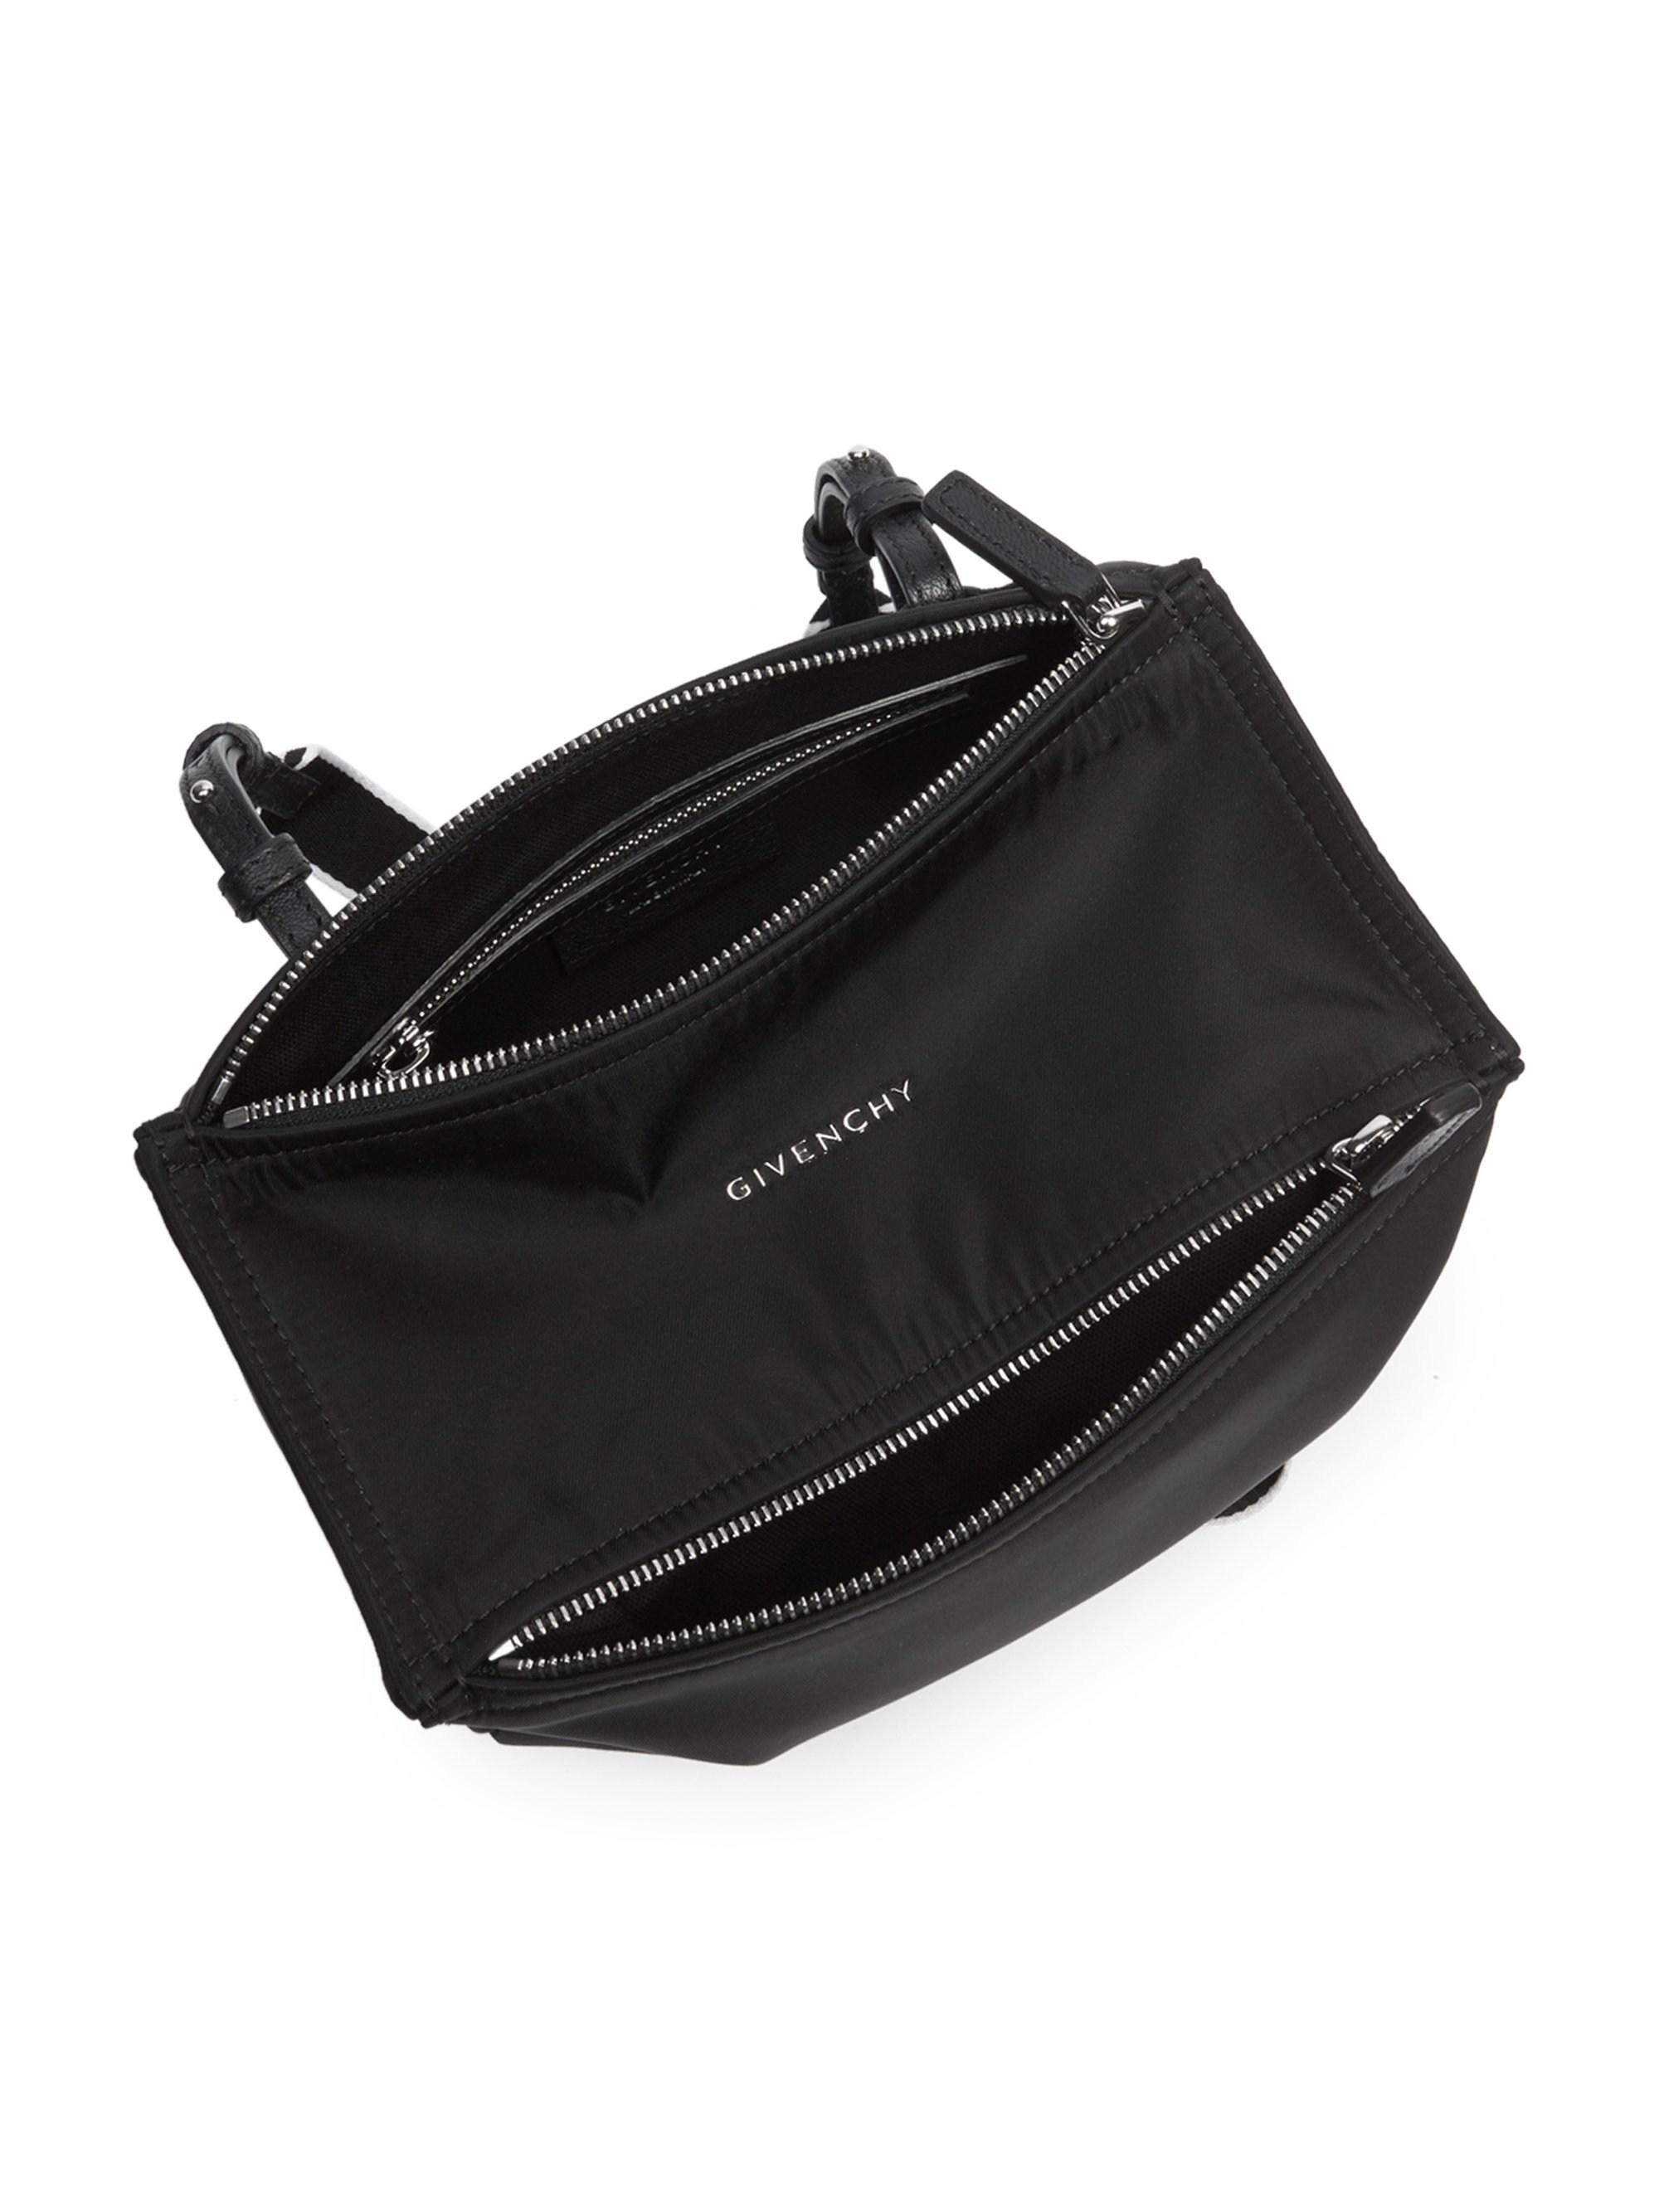 85882c2135 Givenchy Women's Mini Nylon Pandora Bag With Logo Strap - Black in ...